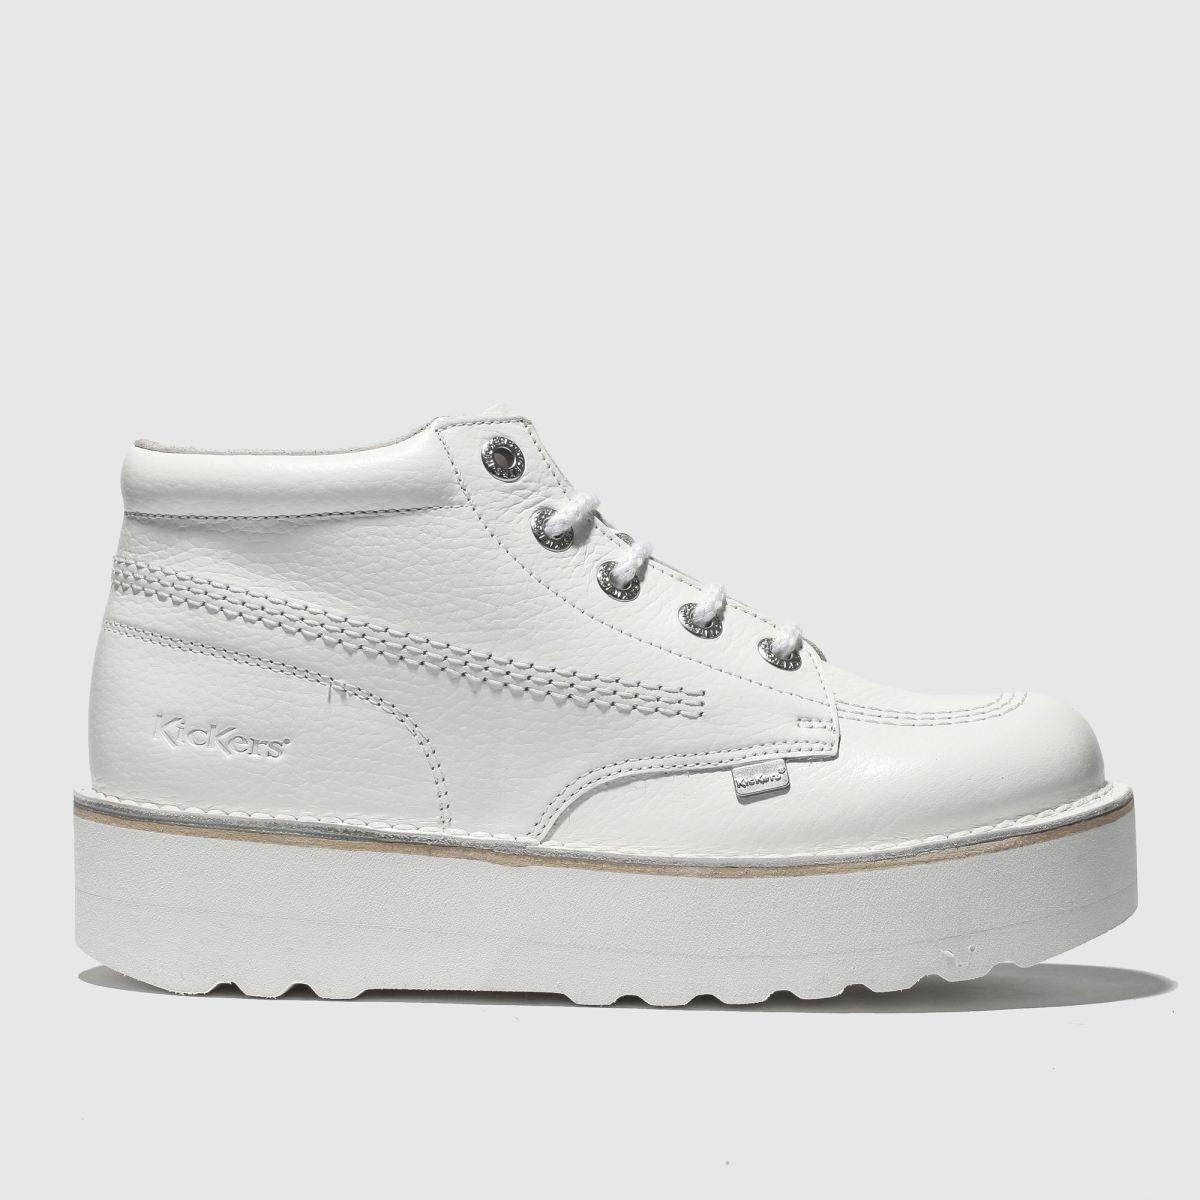 Kickers White Kick Hi Stack Flat Shoes